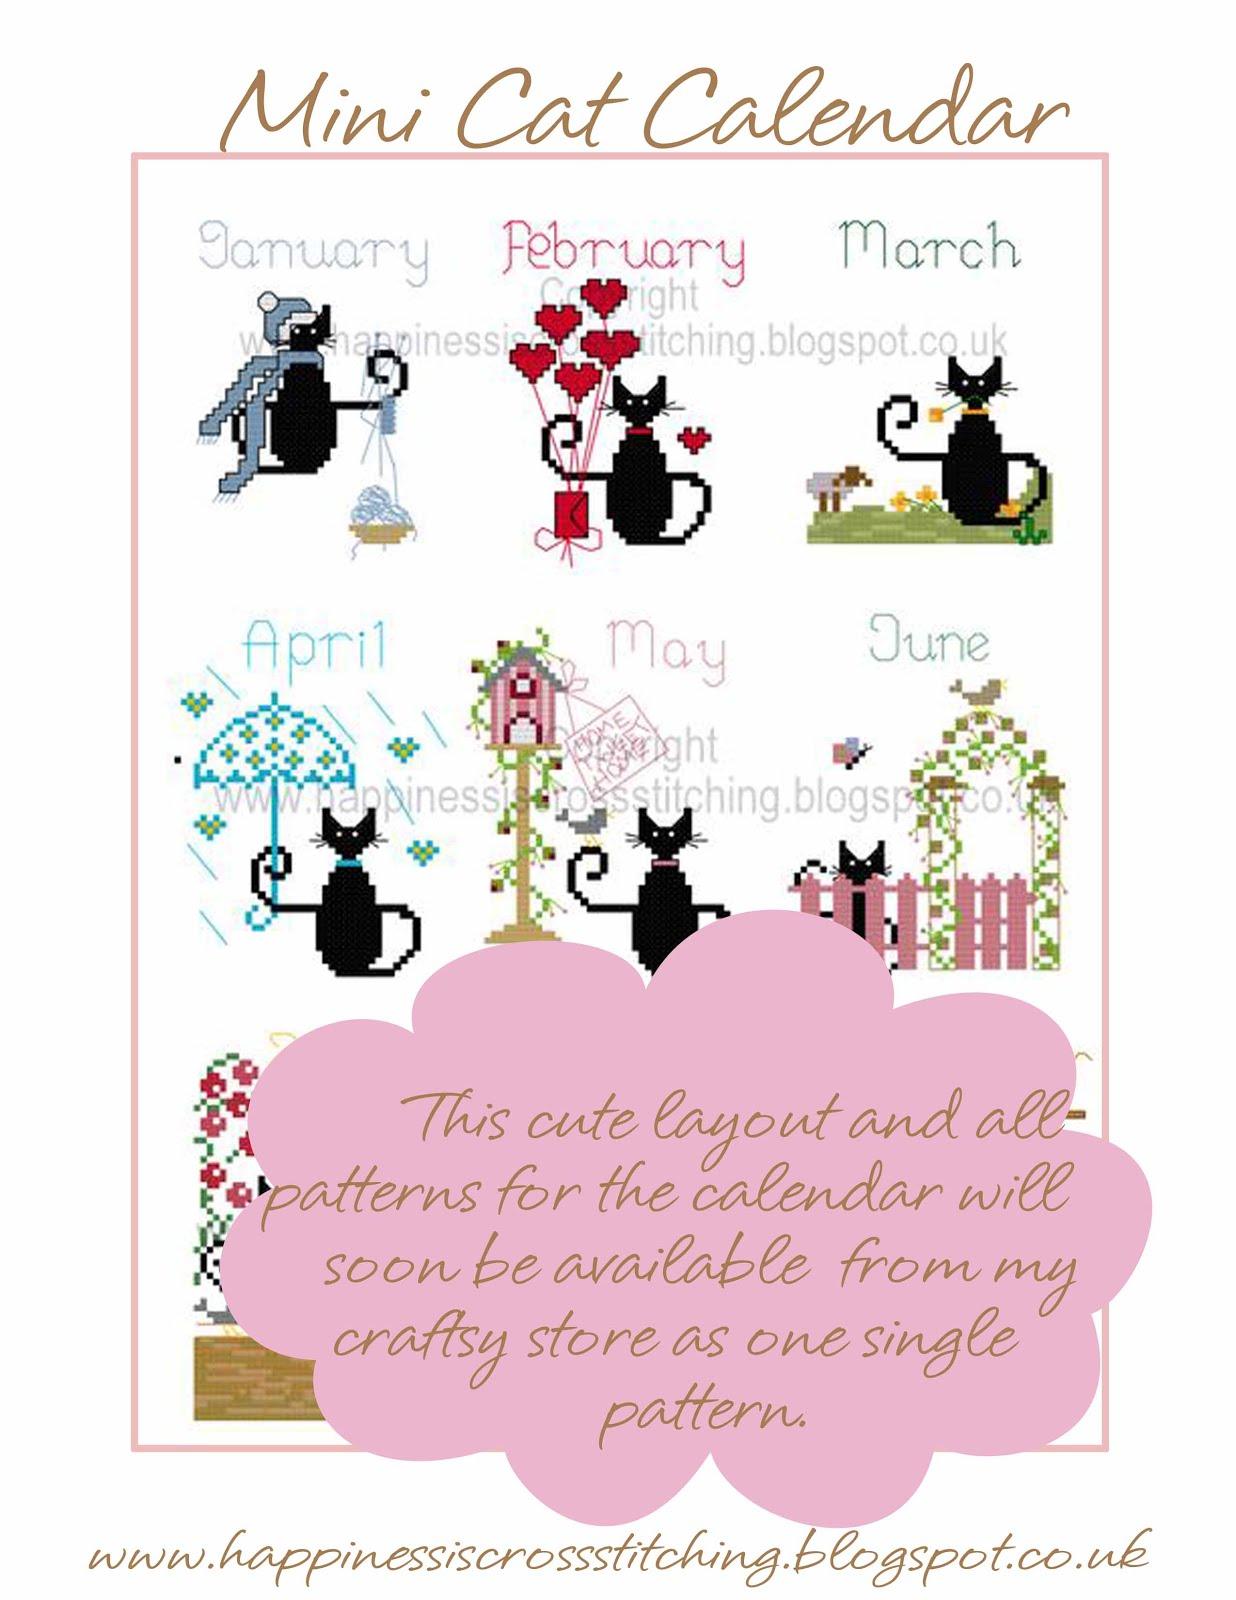 Mini Cat Calendar Layout